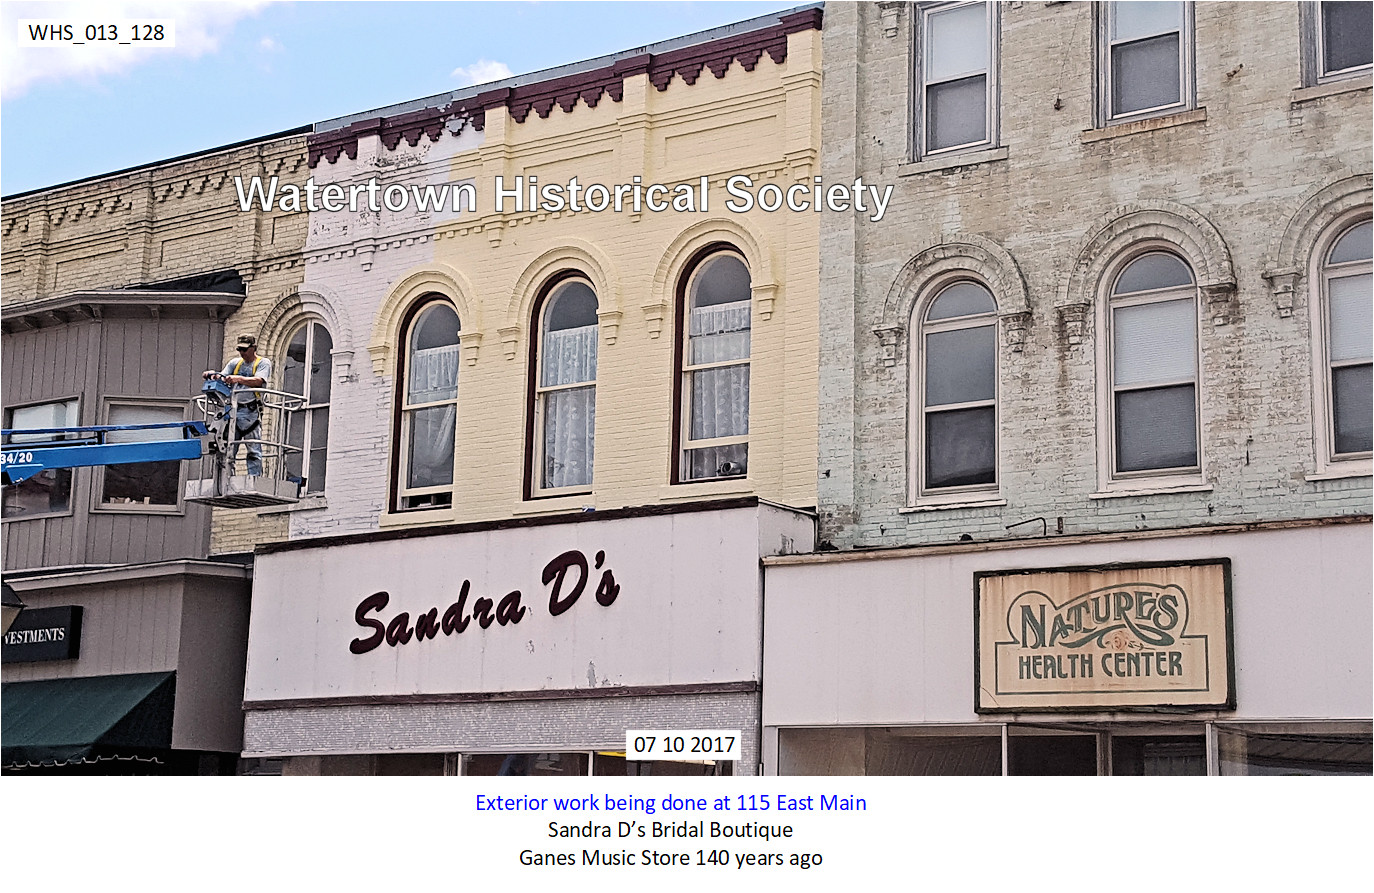 sandra d s bridal boutique 2017 115 e main exterior work whs 013 128